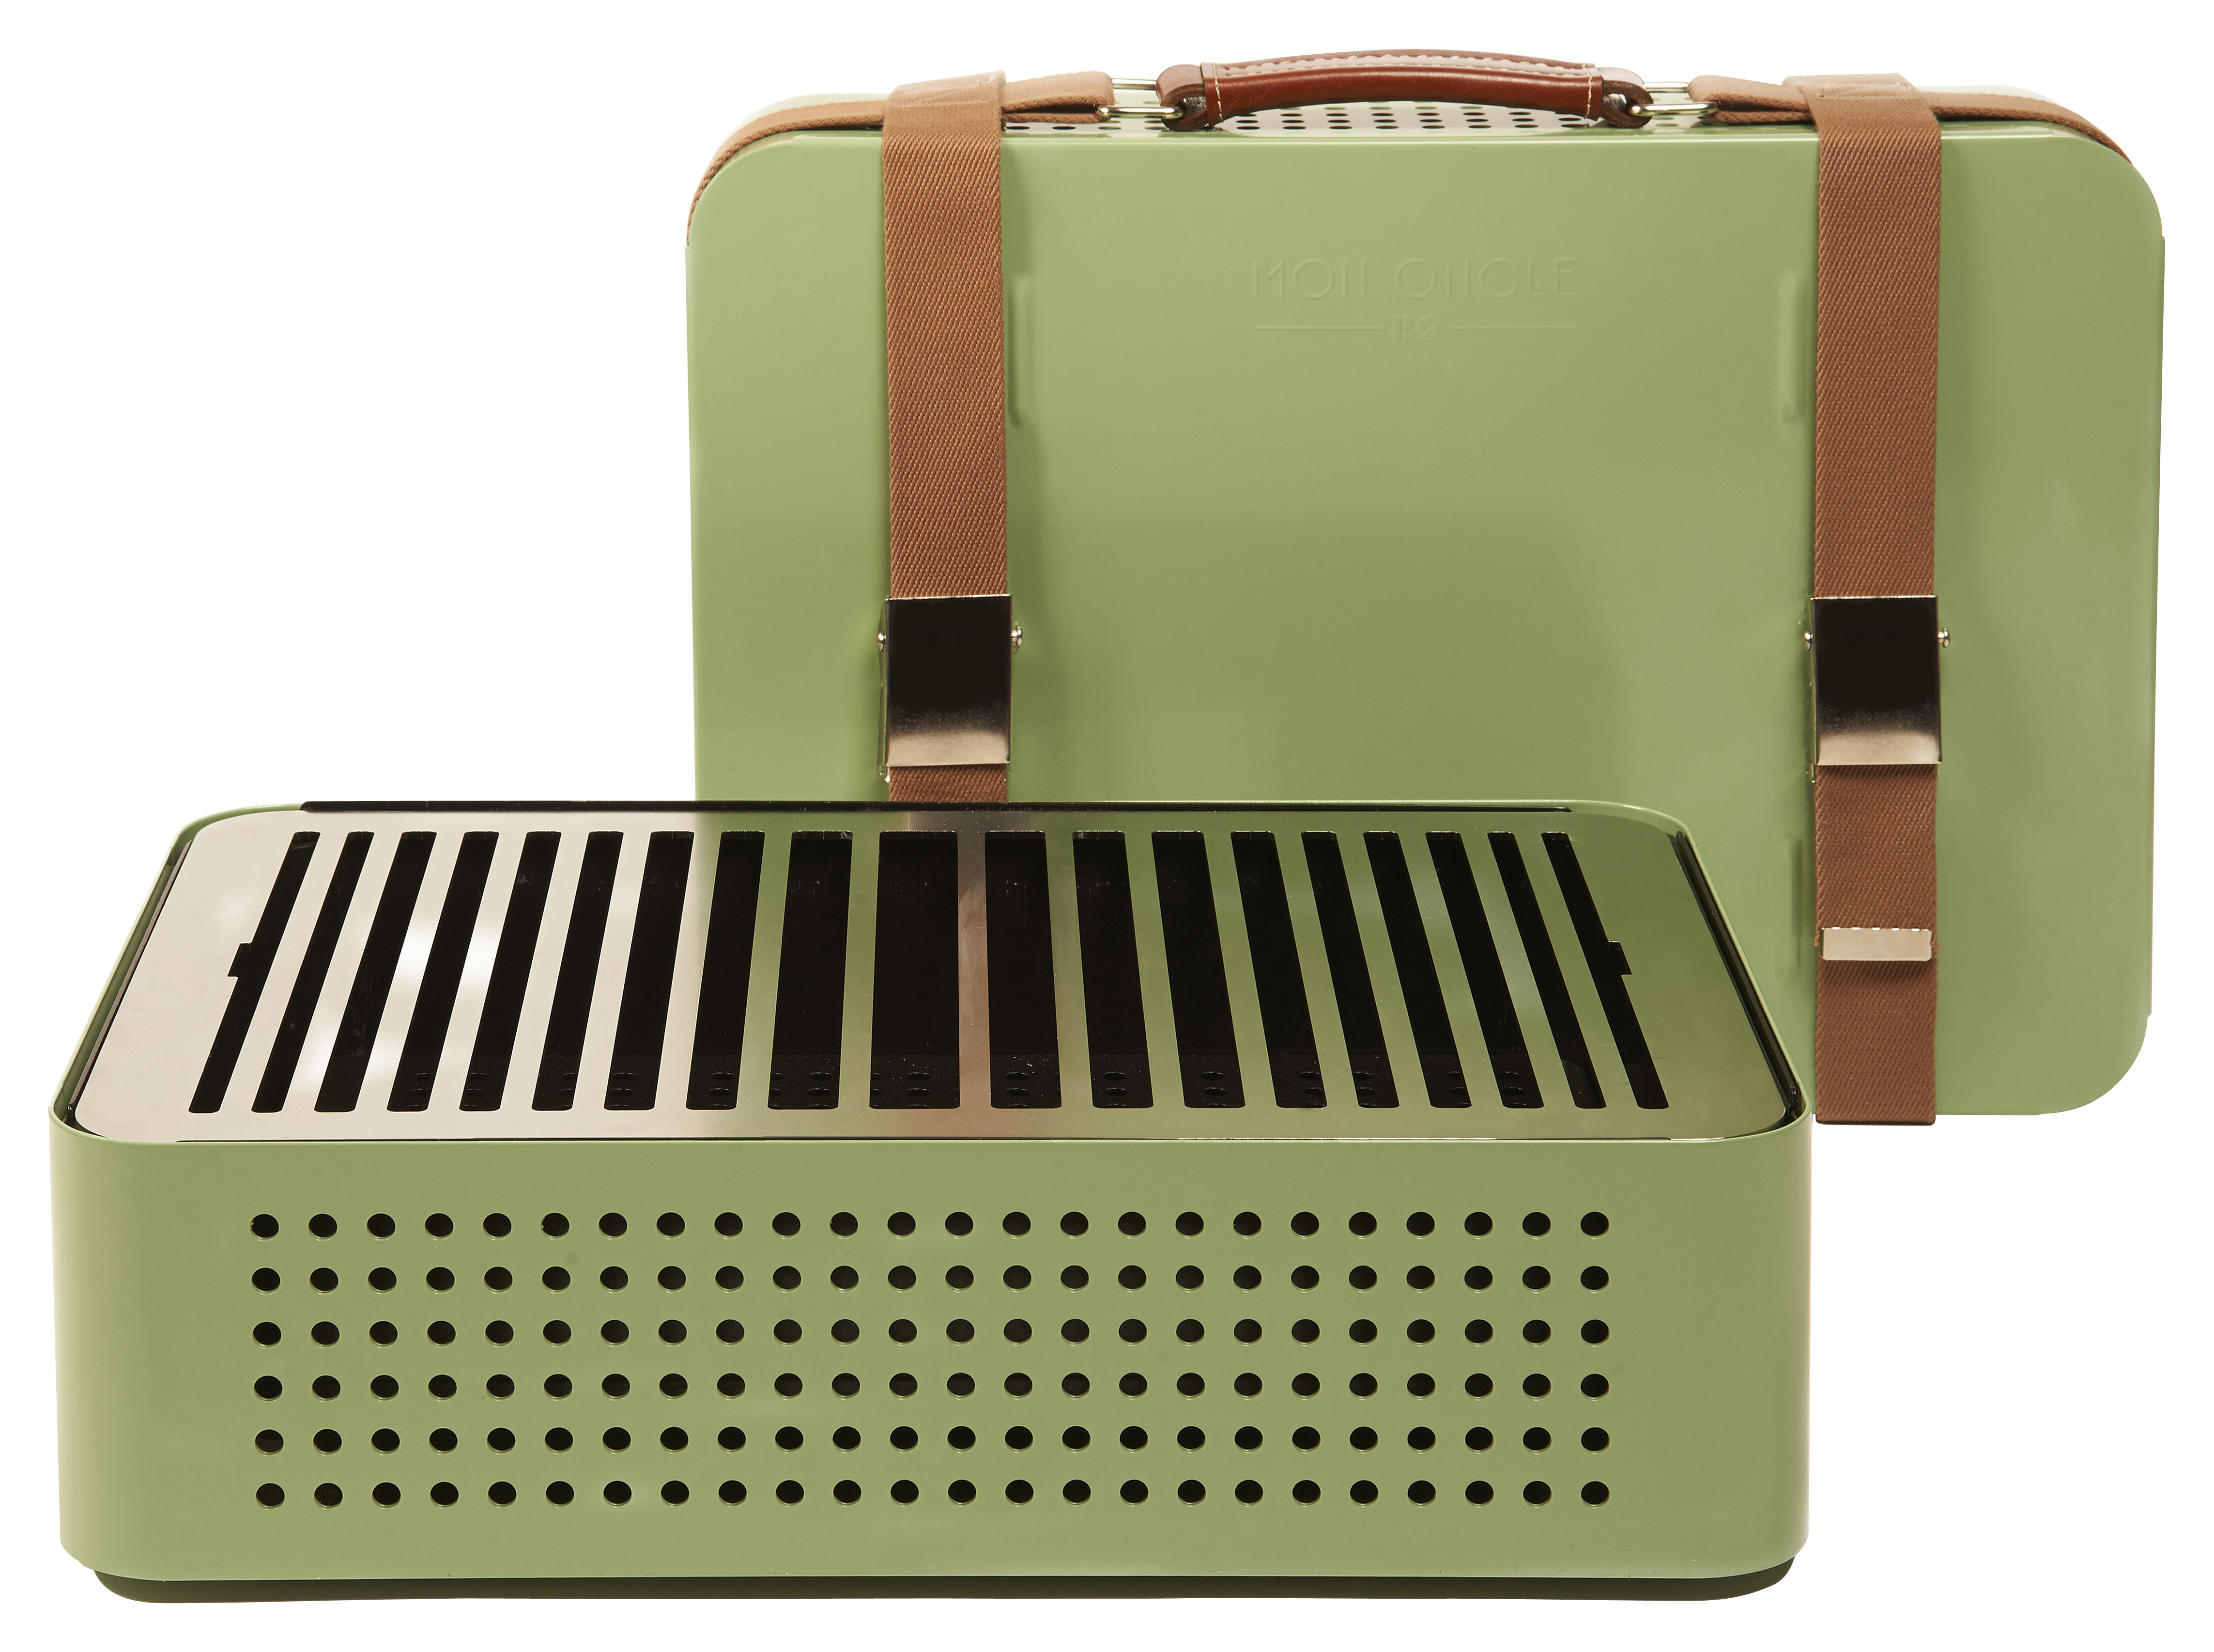 Outdoor - Barbecues et braséros - Barbecue portable à charbon Mon Oncle / 44 x 32 cm - RS BARCELONA - Vert - Acier inoxydable peint, Cuir, Tissu